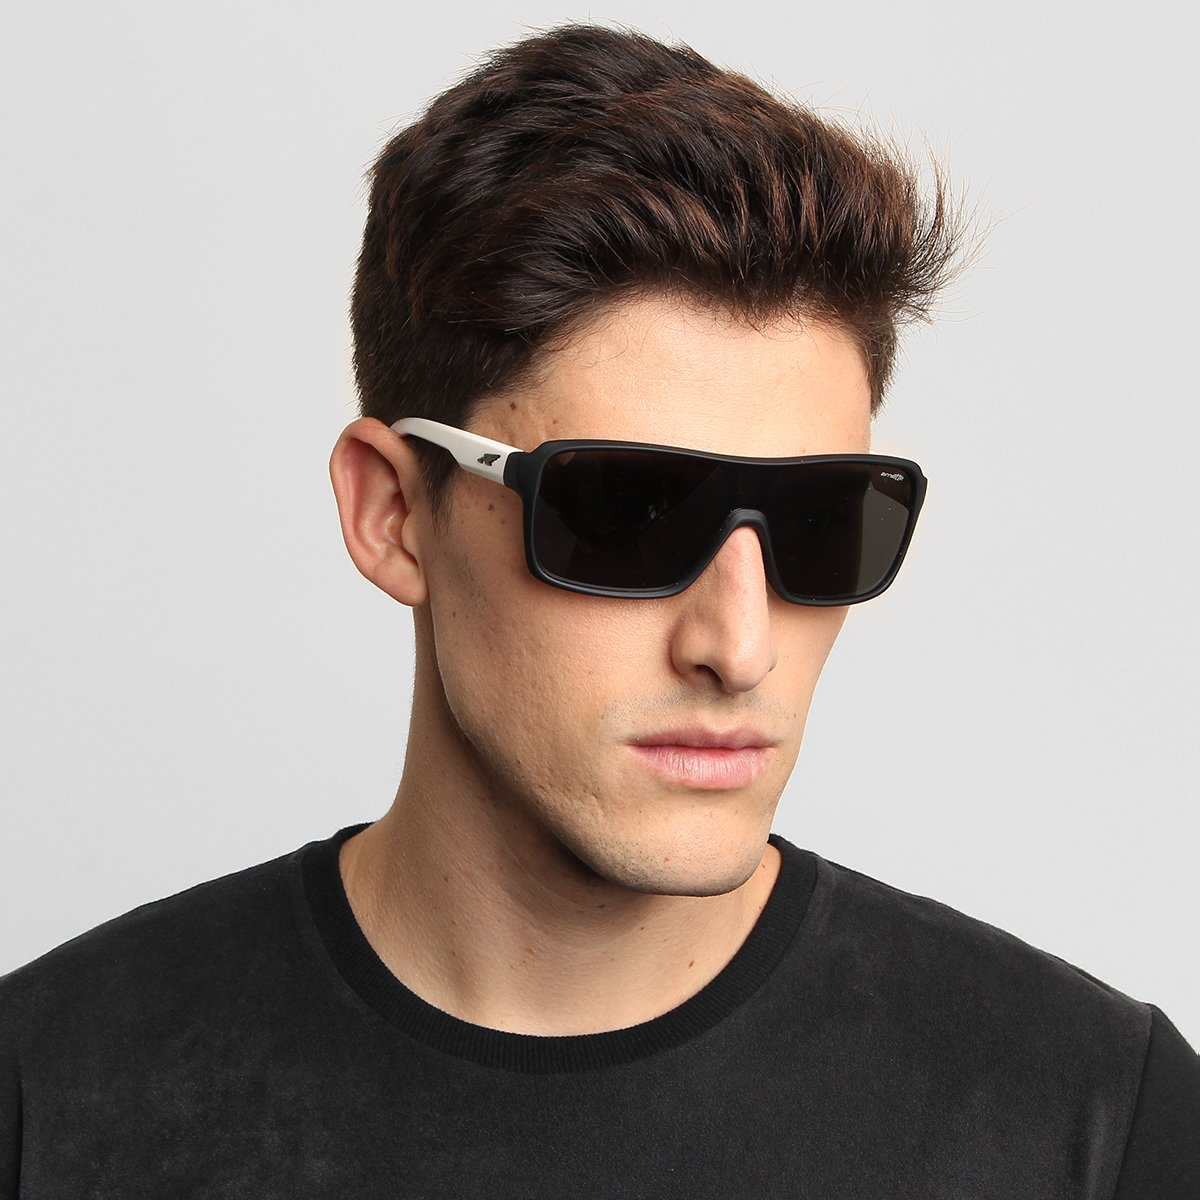 Óculos Arnette Tall Boy - Compre Agora   Netshoes 745a528e7e